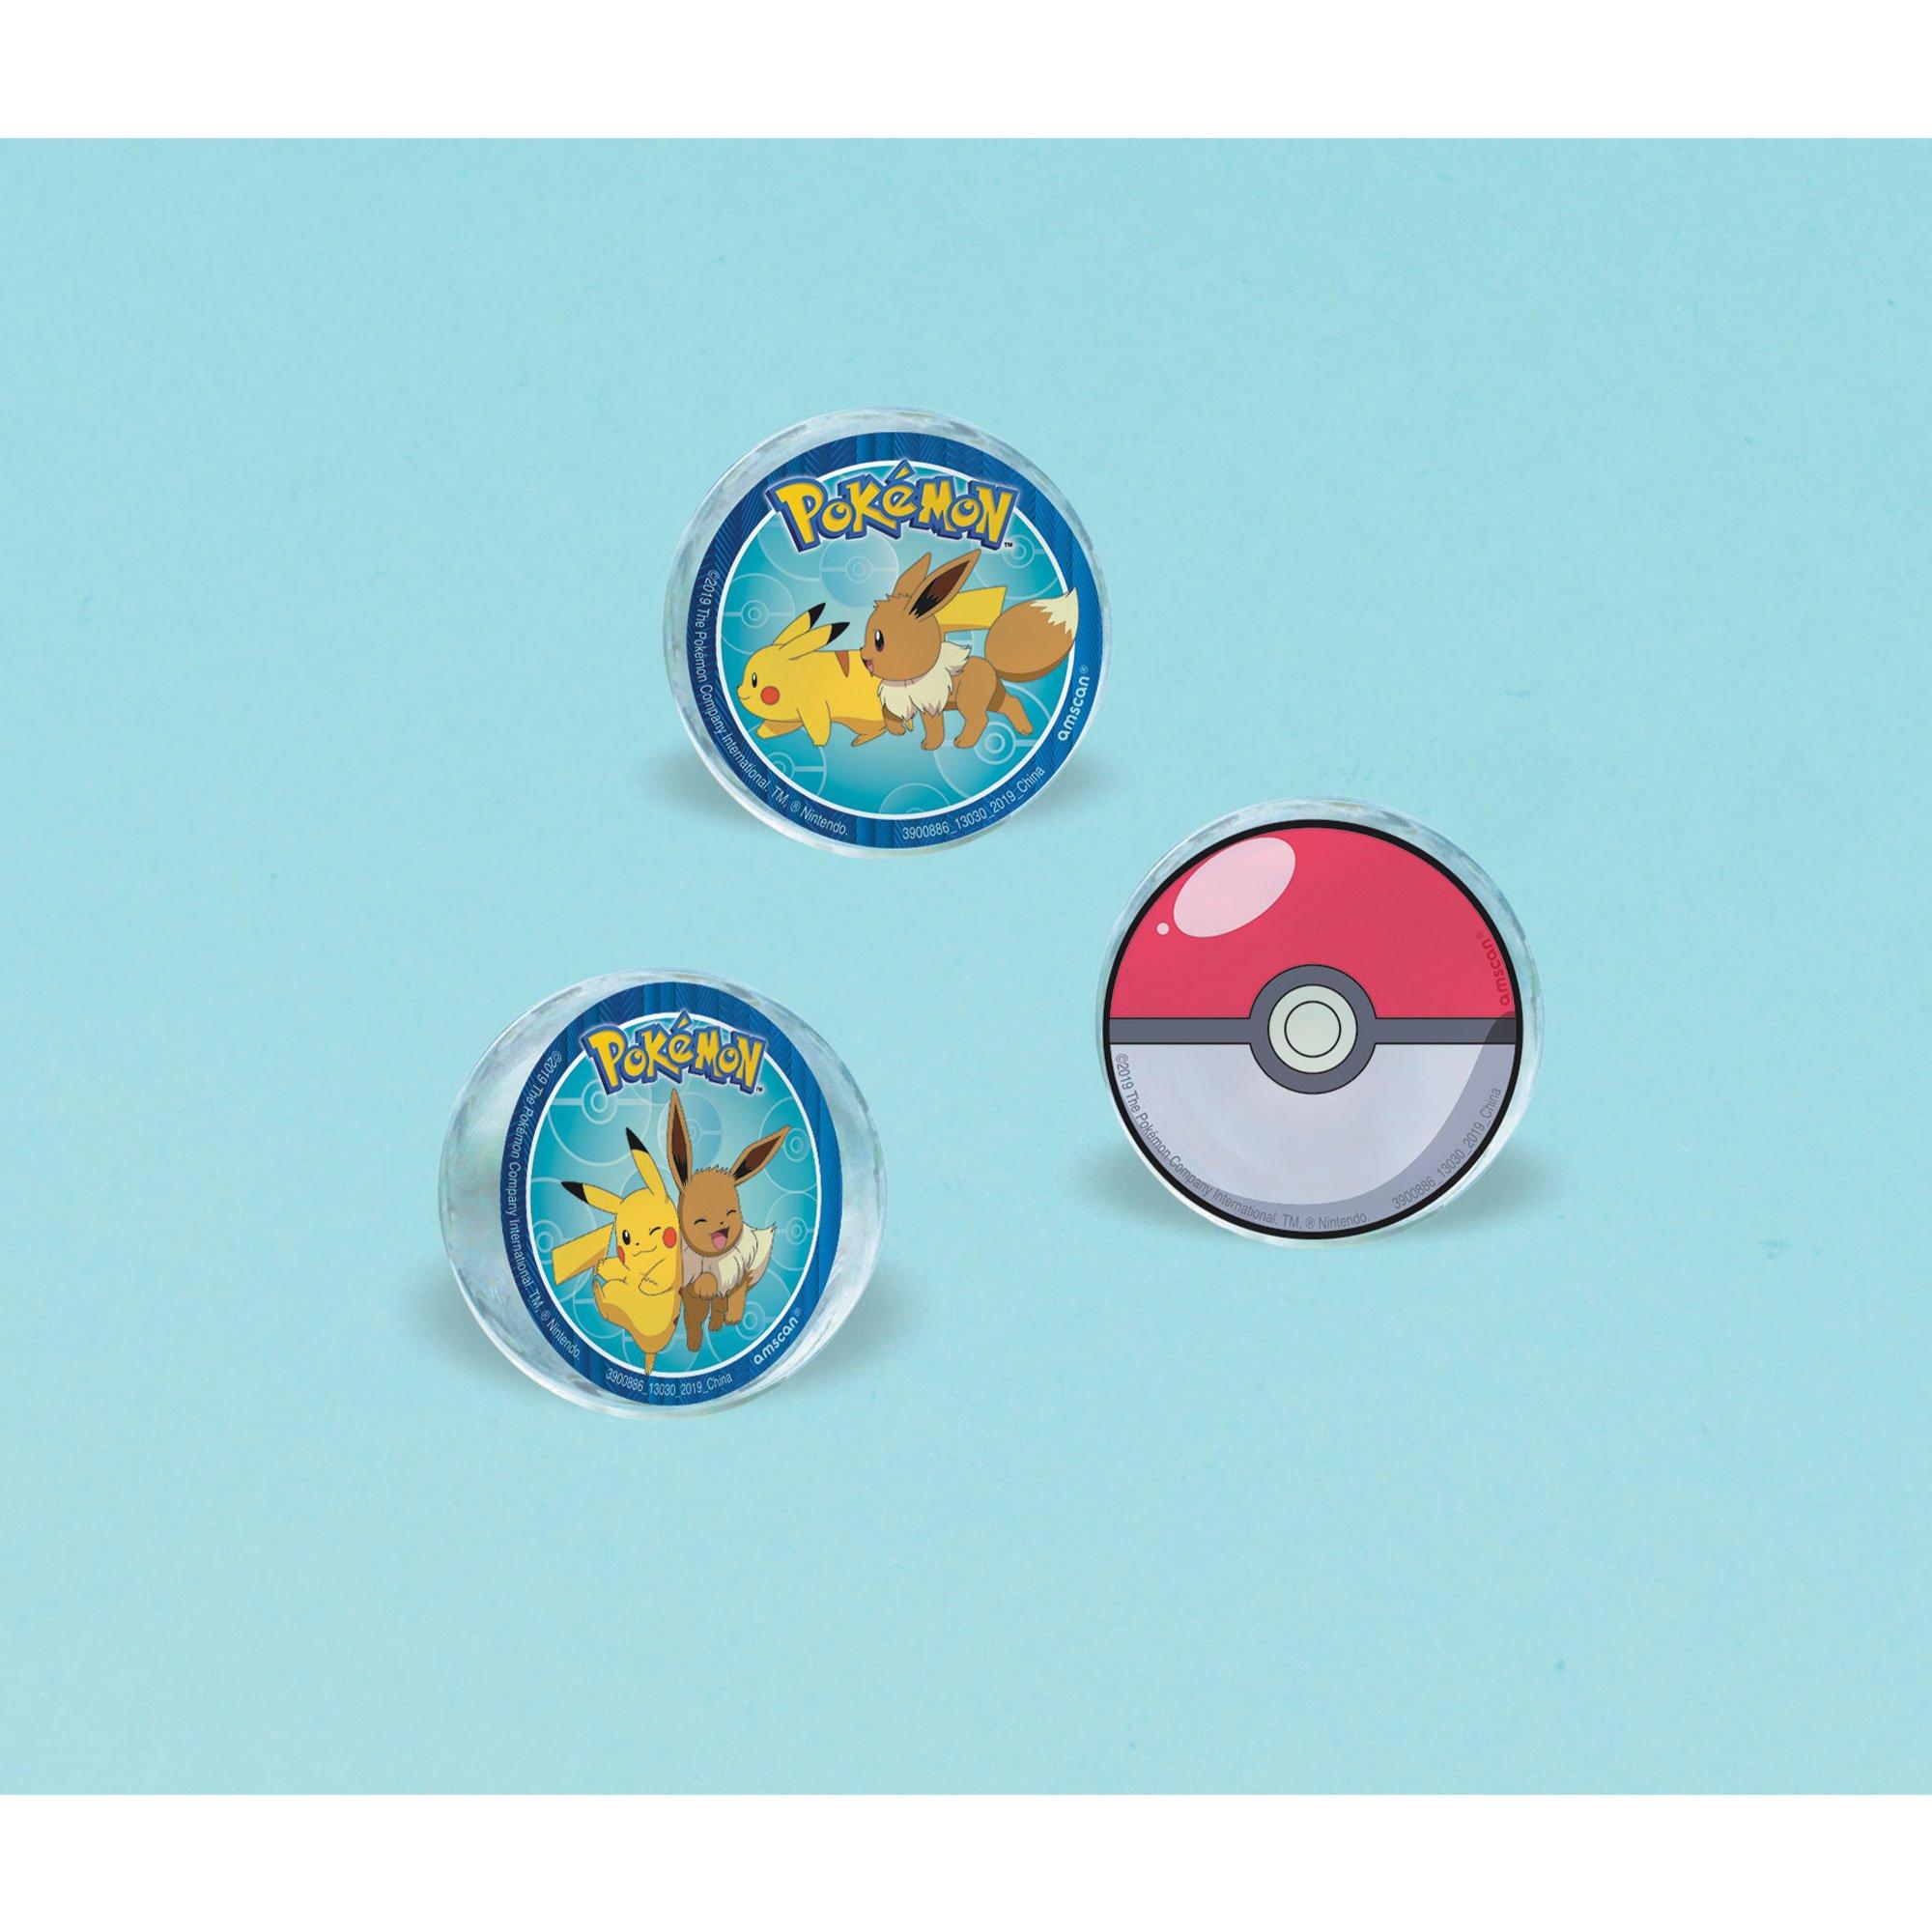 Pokemon Classic Bounce Balls